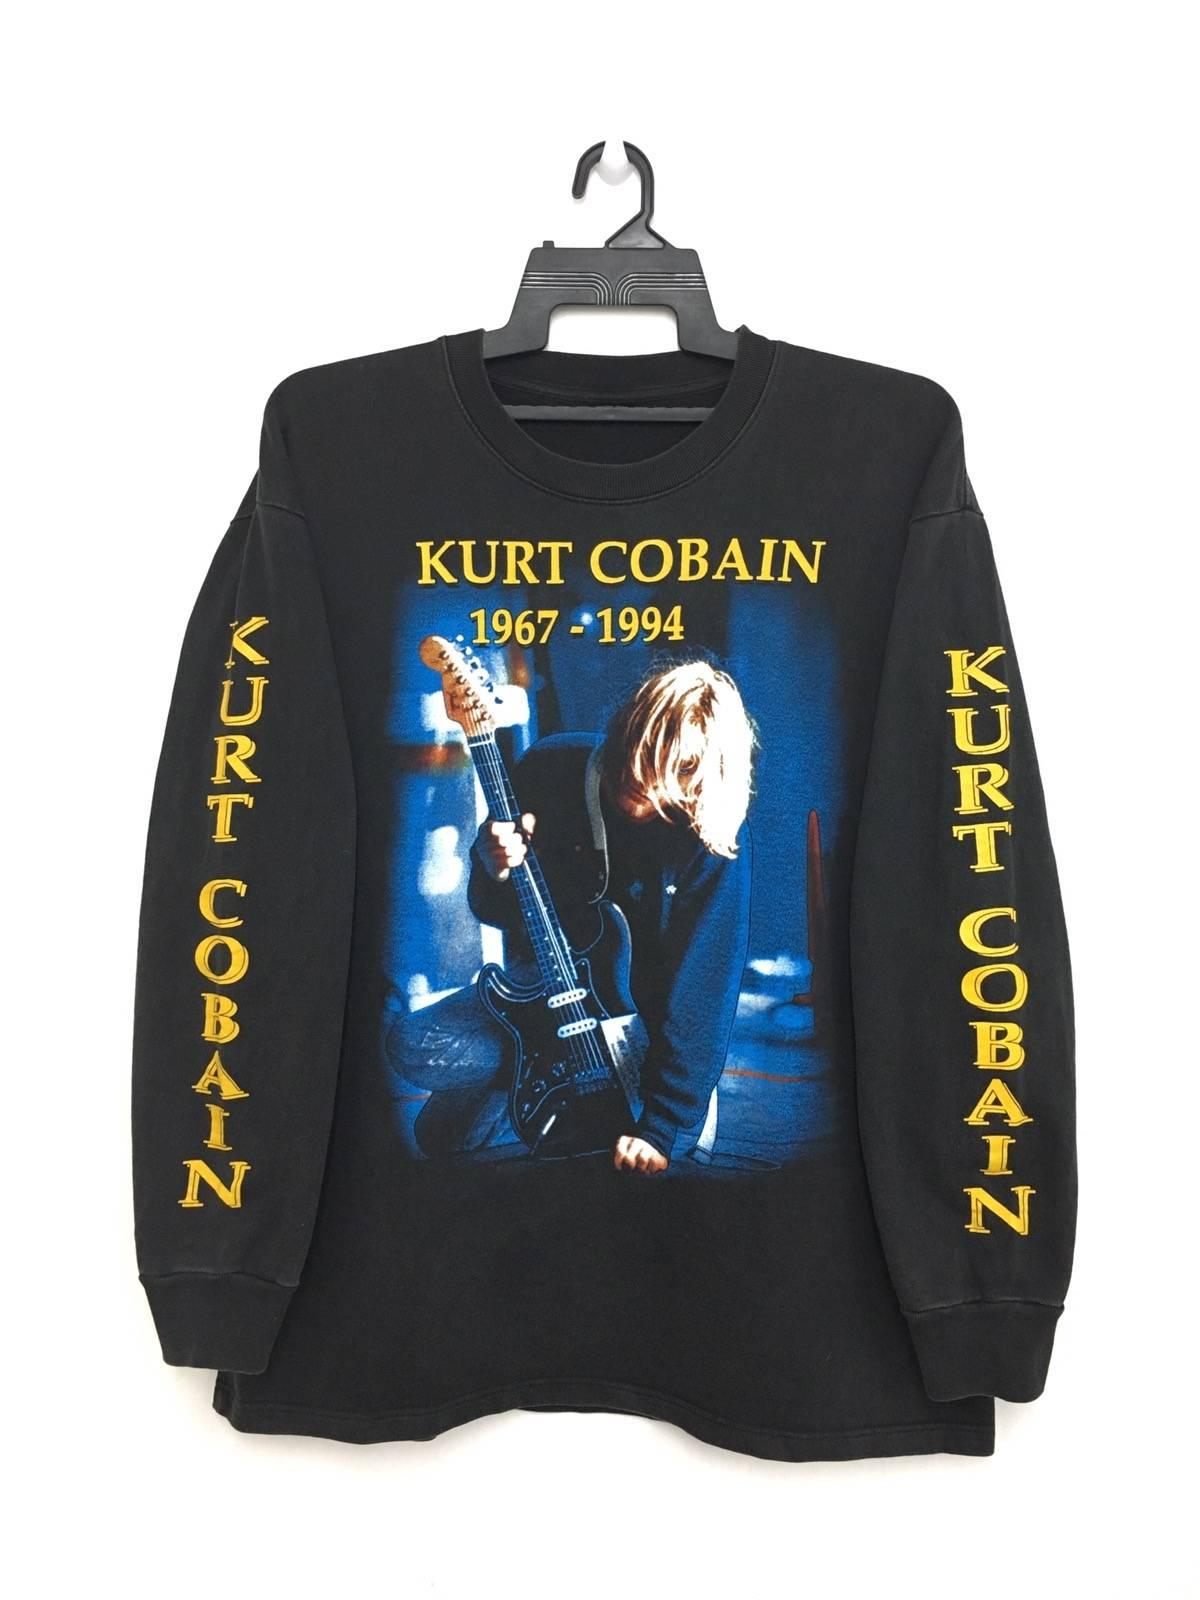 Kurt cobain grailed kurt cobain rare vintage 90s nirvana long sleeve shirt bootleg kurt cobain in memory black color gumiabroncs Images